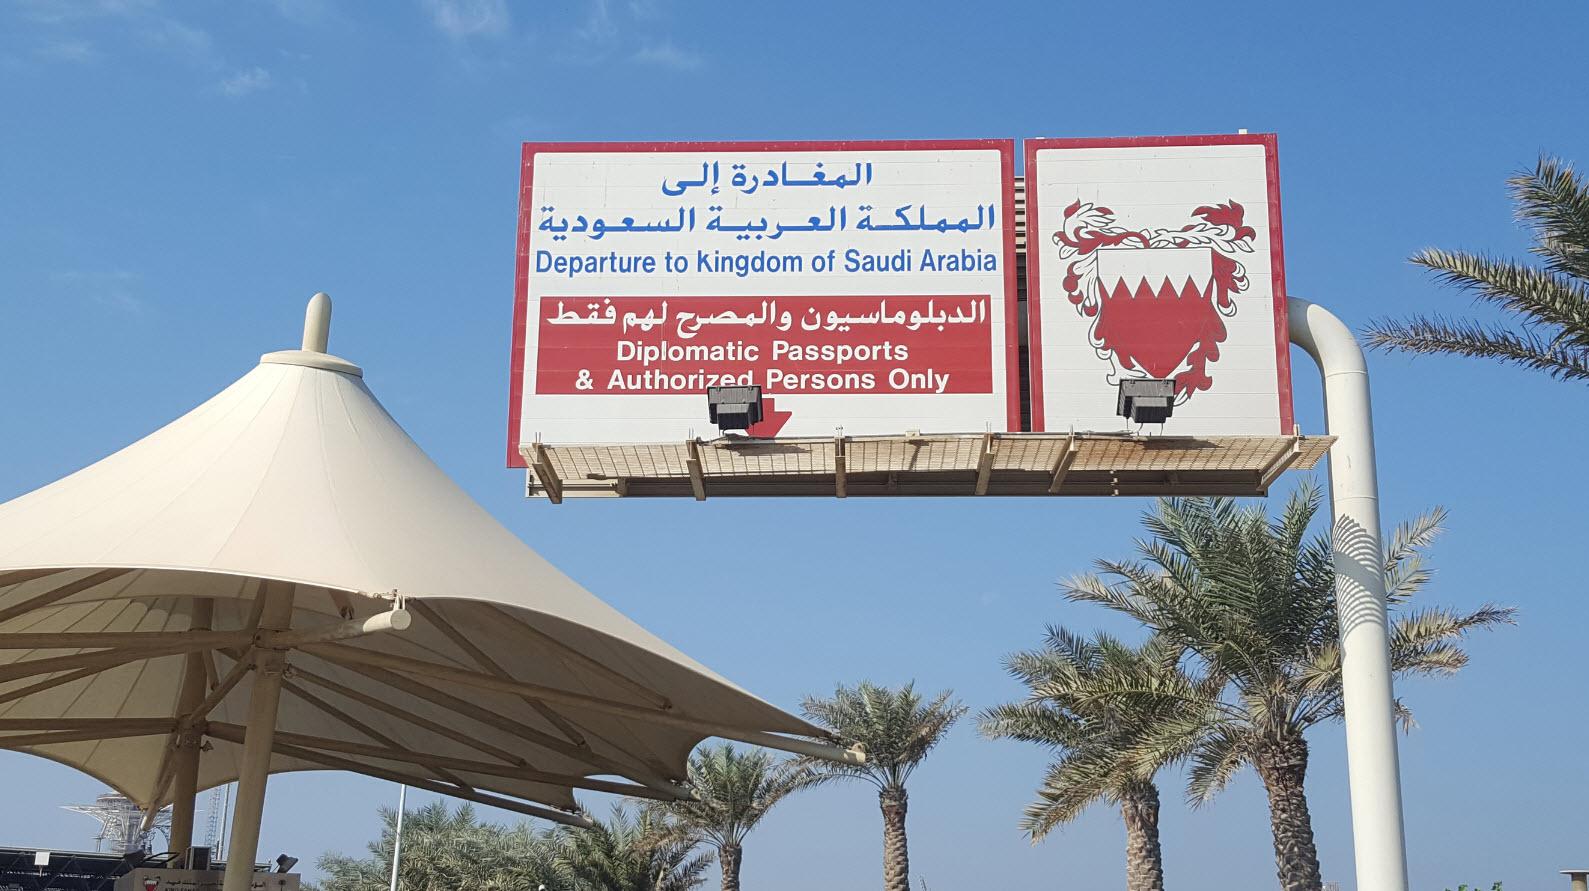 The King Fahd Causeway 2